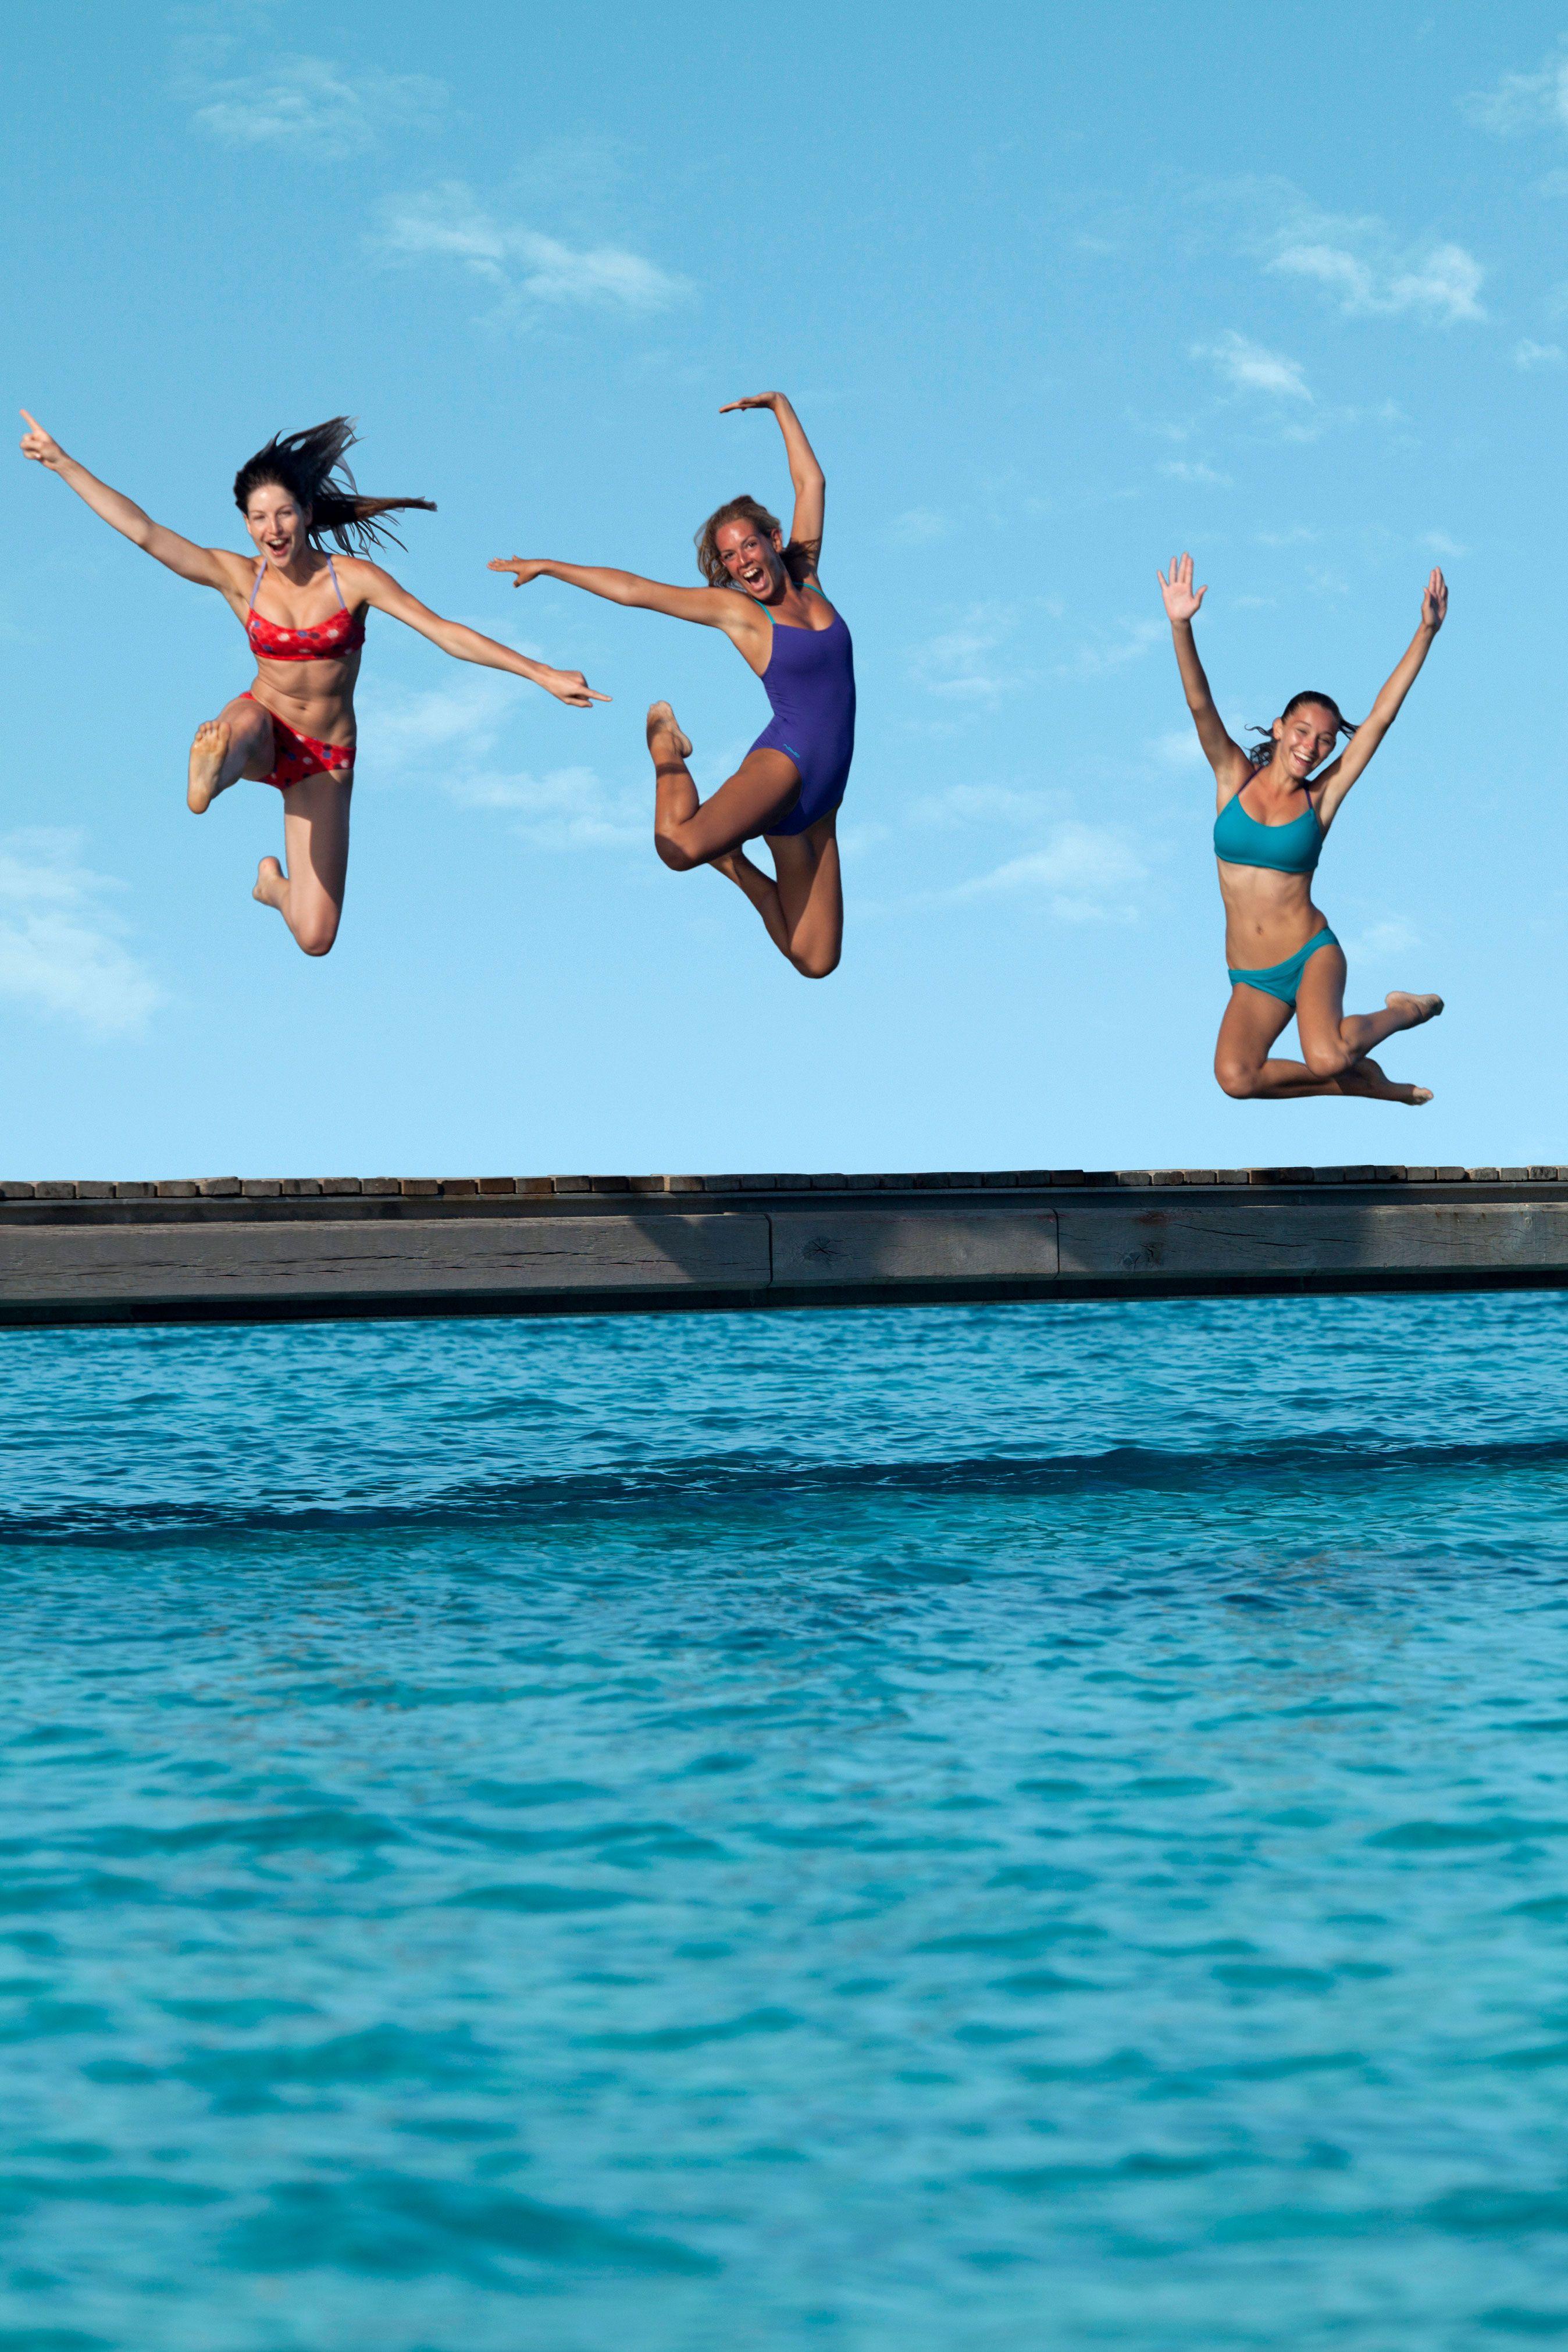 Sea, swim and fun! #OrvisWomen